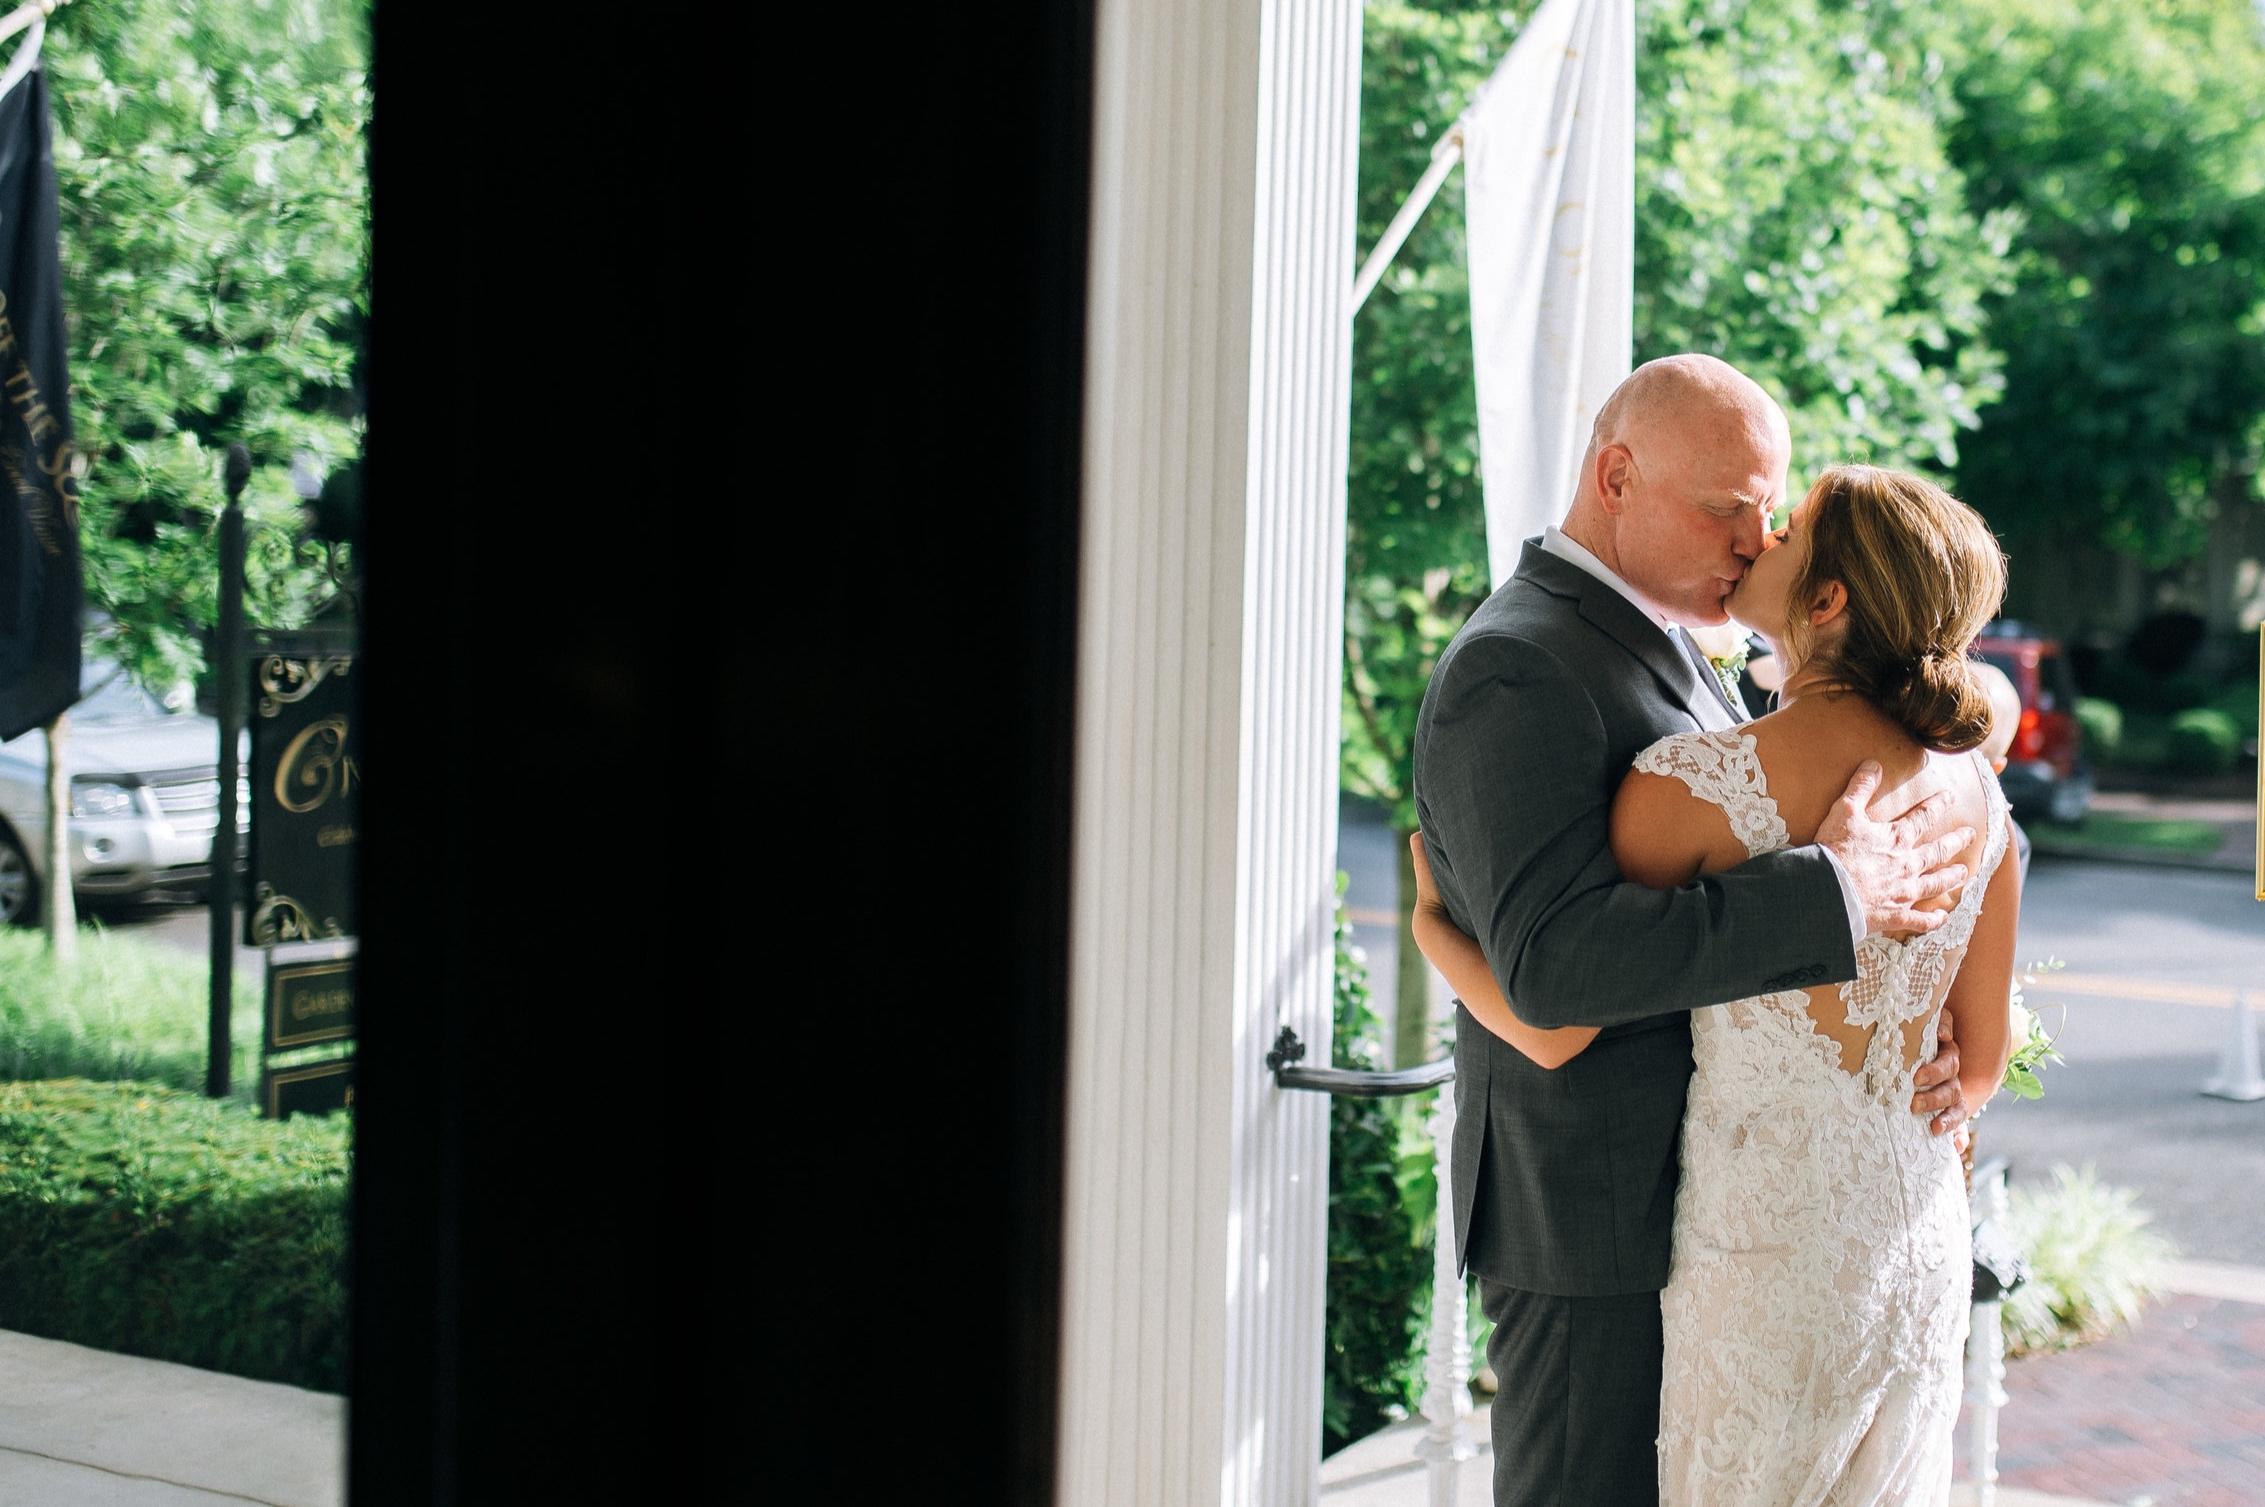 Molly + Vince Franklin Wedding - at CJs Off the Square by Details Nashville